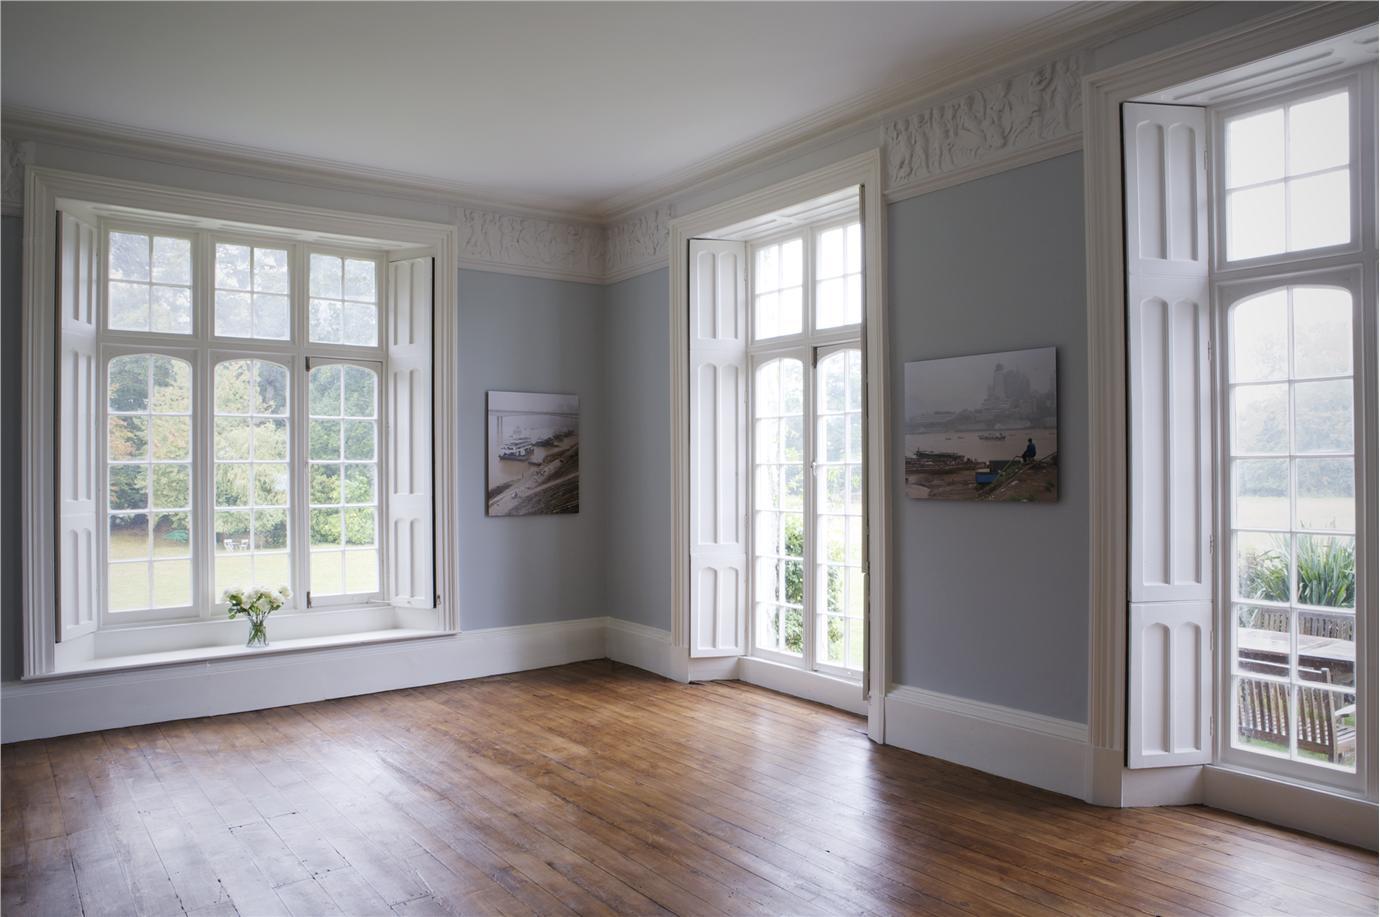 farrow ball skylight 205. Black Bedroom Furniture Sets. Home Design Ideas